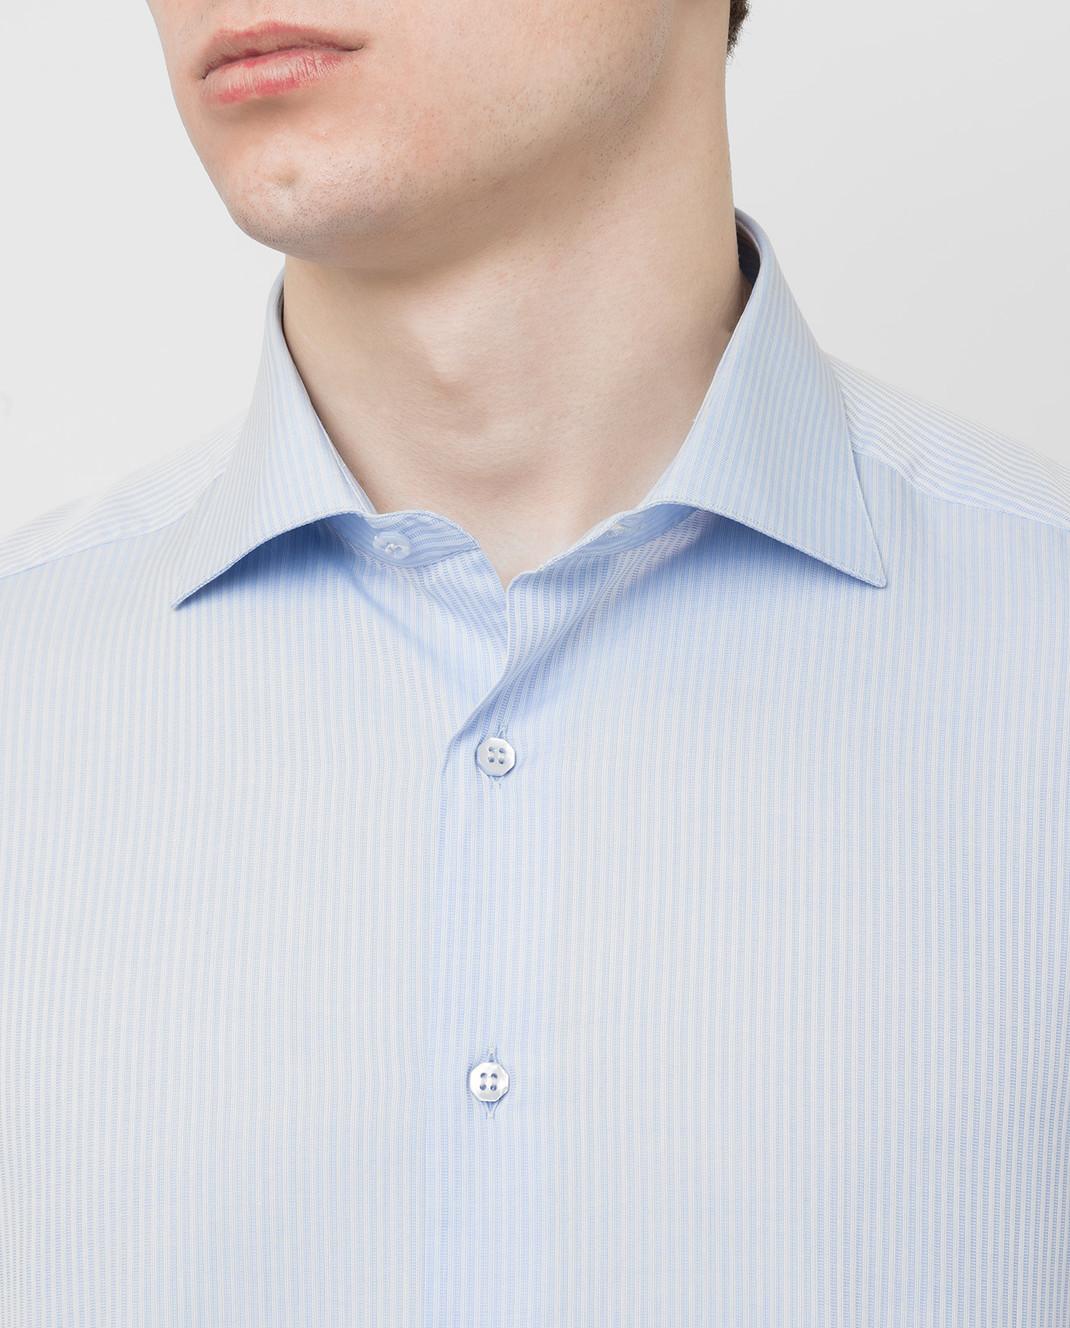 Stefano Ricci Голубая рубашка MC000540L1803 изображение 5